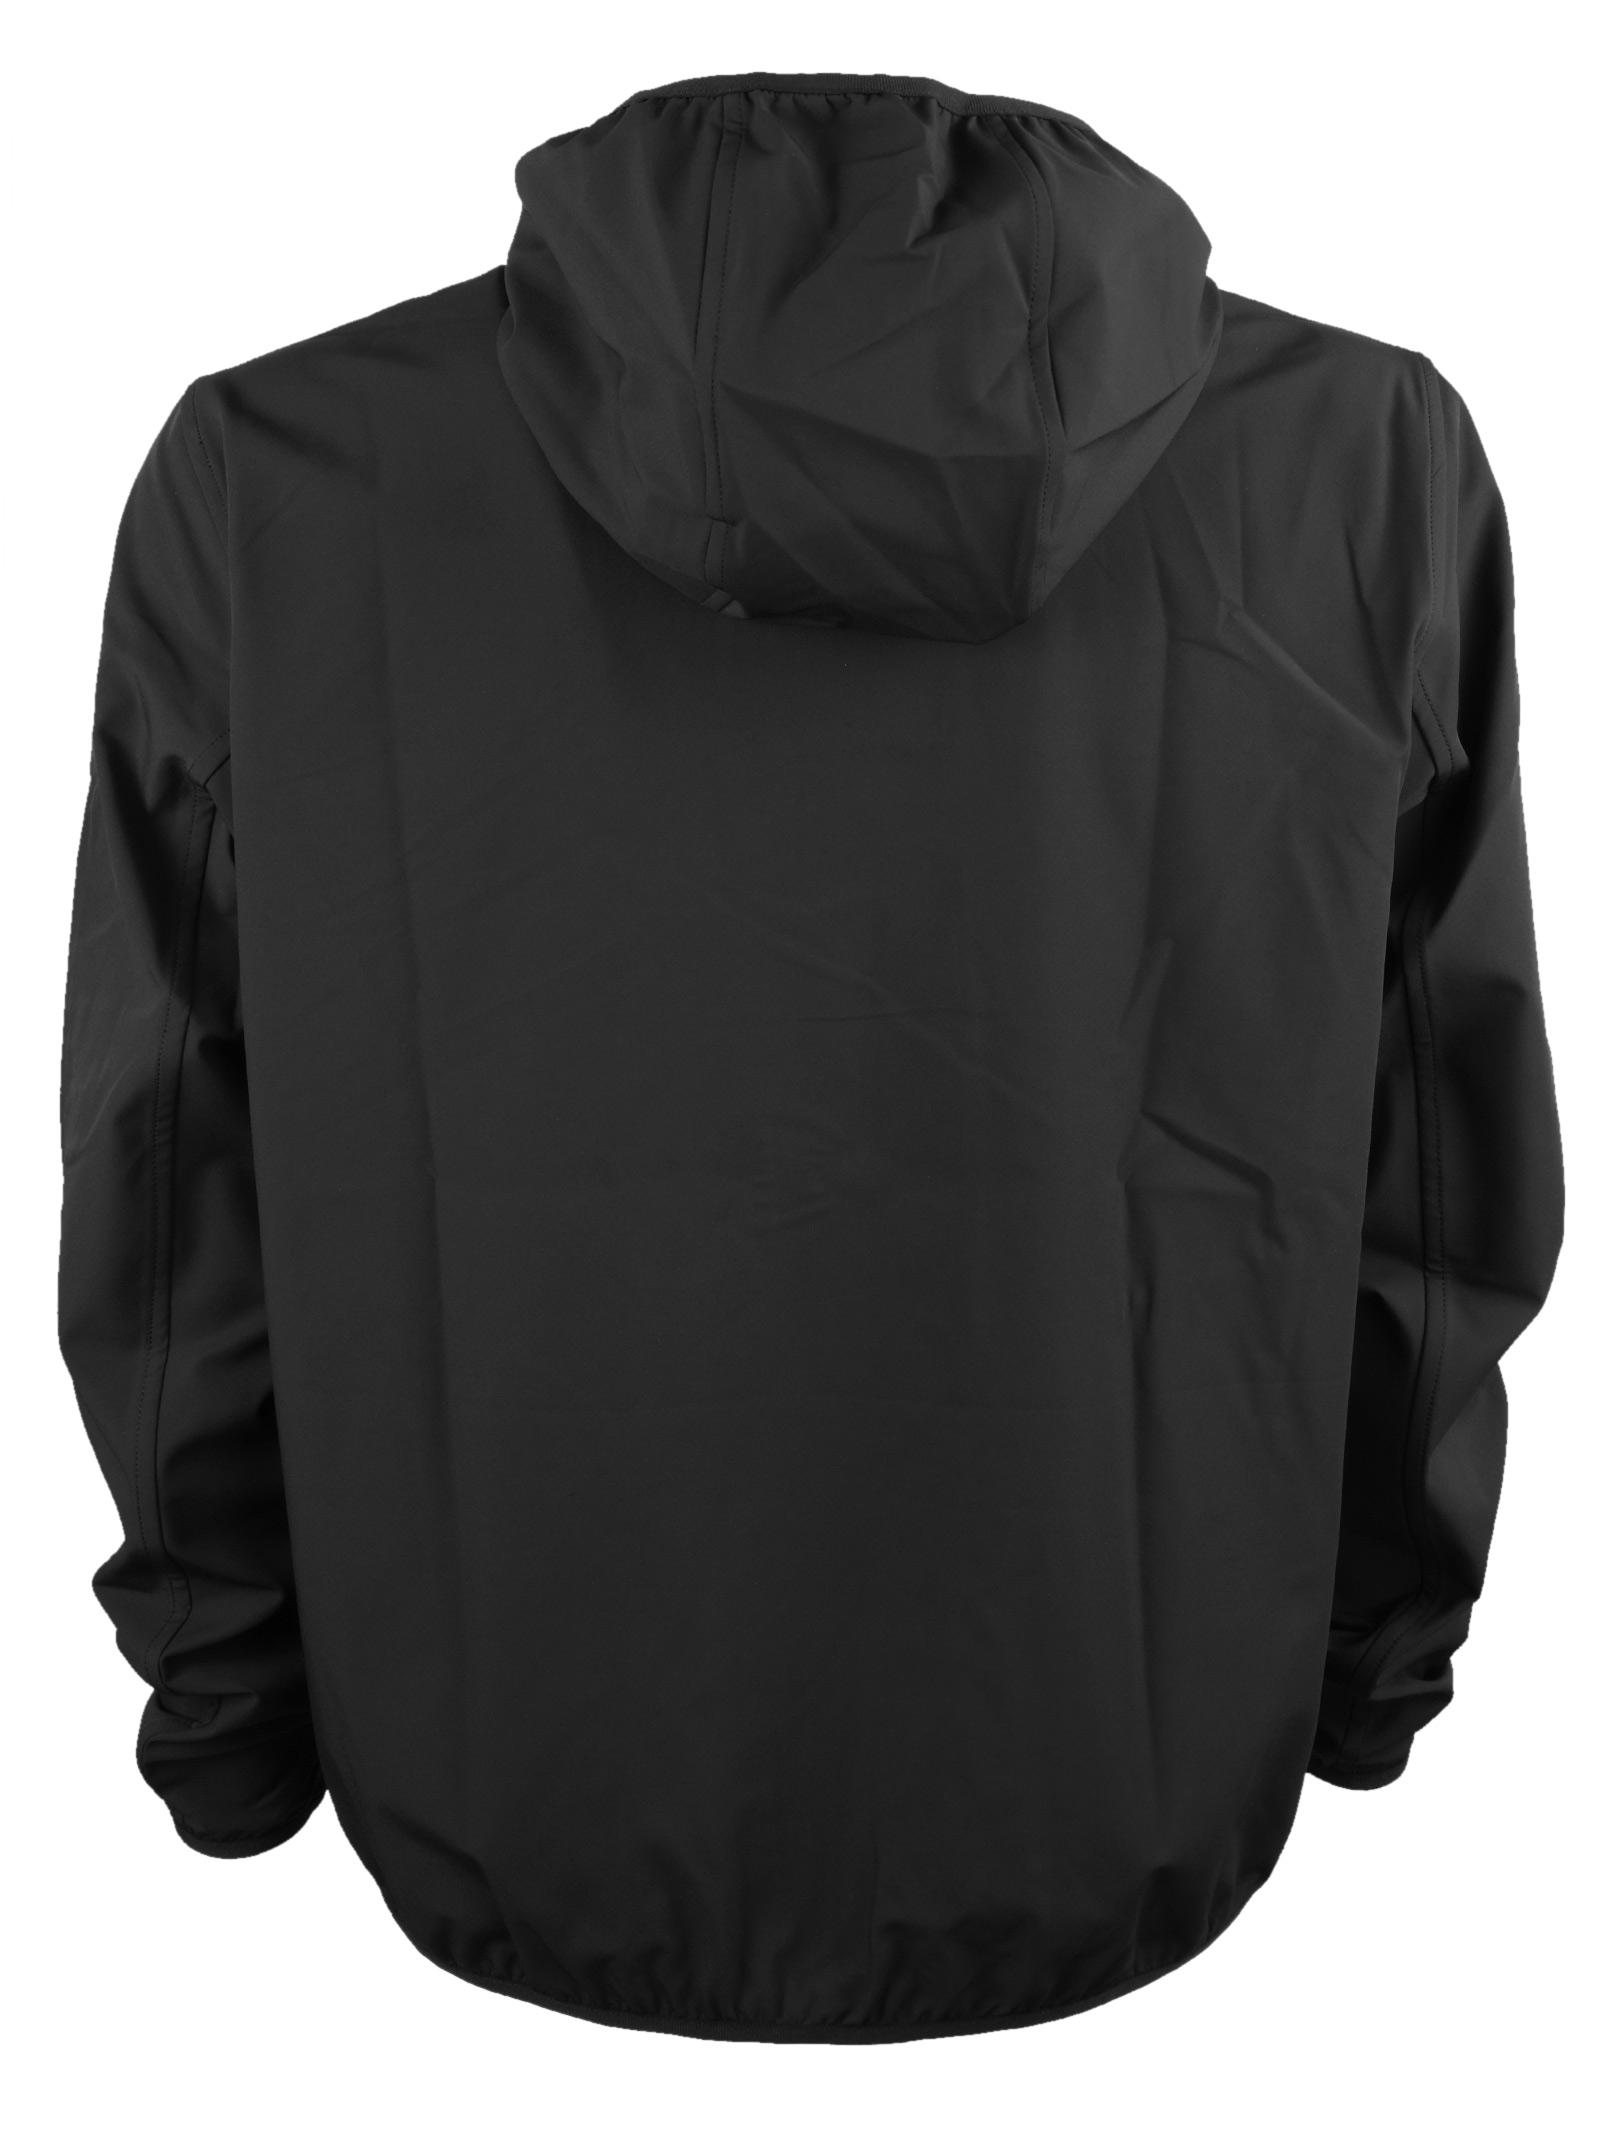 Hood jacket stretch and light MUSEUM | Jackets | WARWICK NY918C002